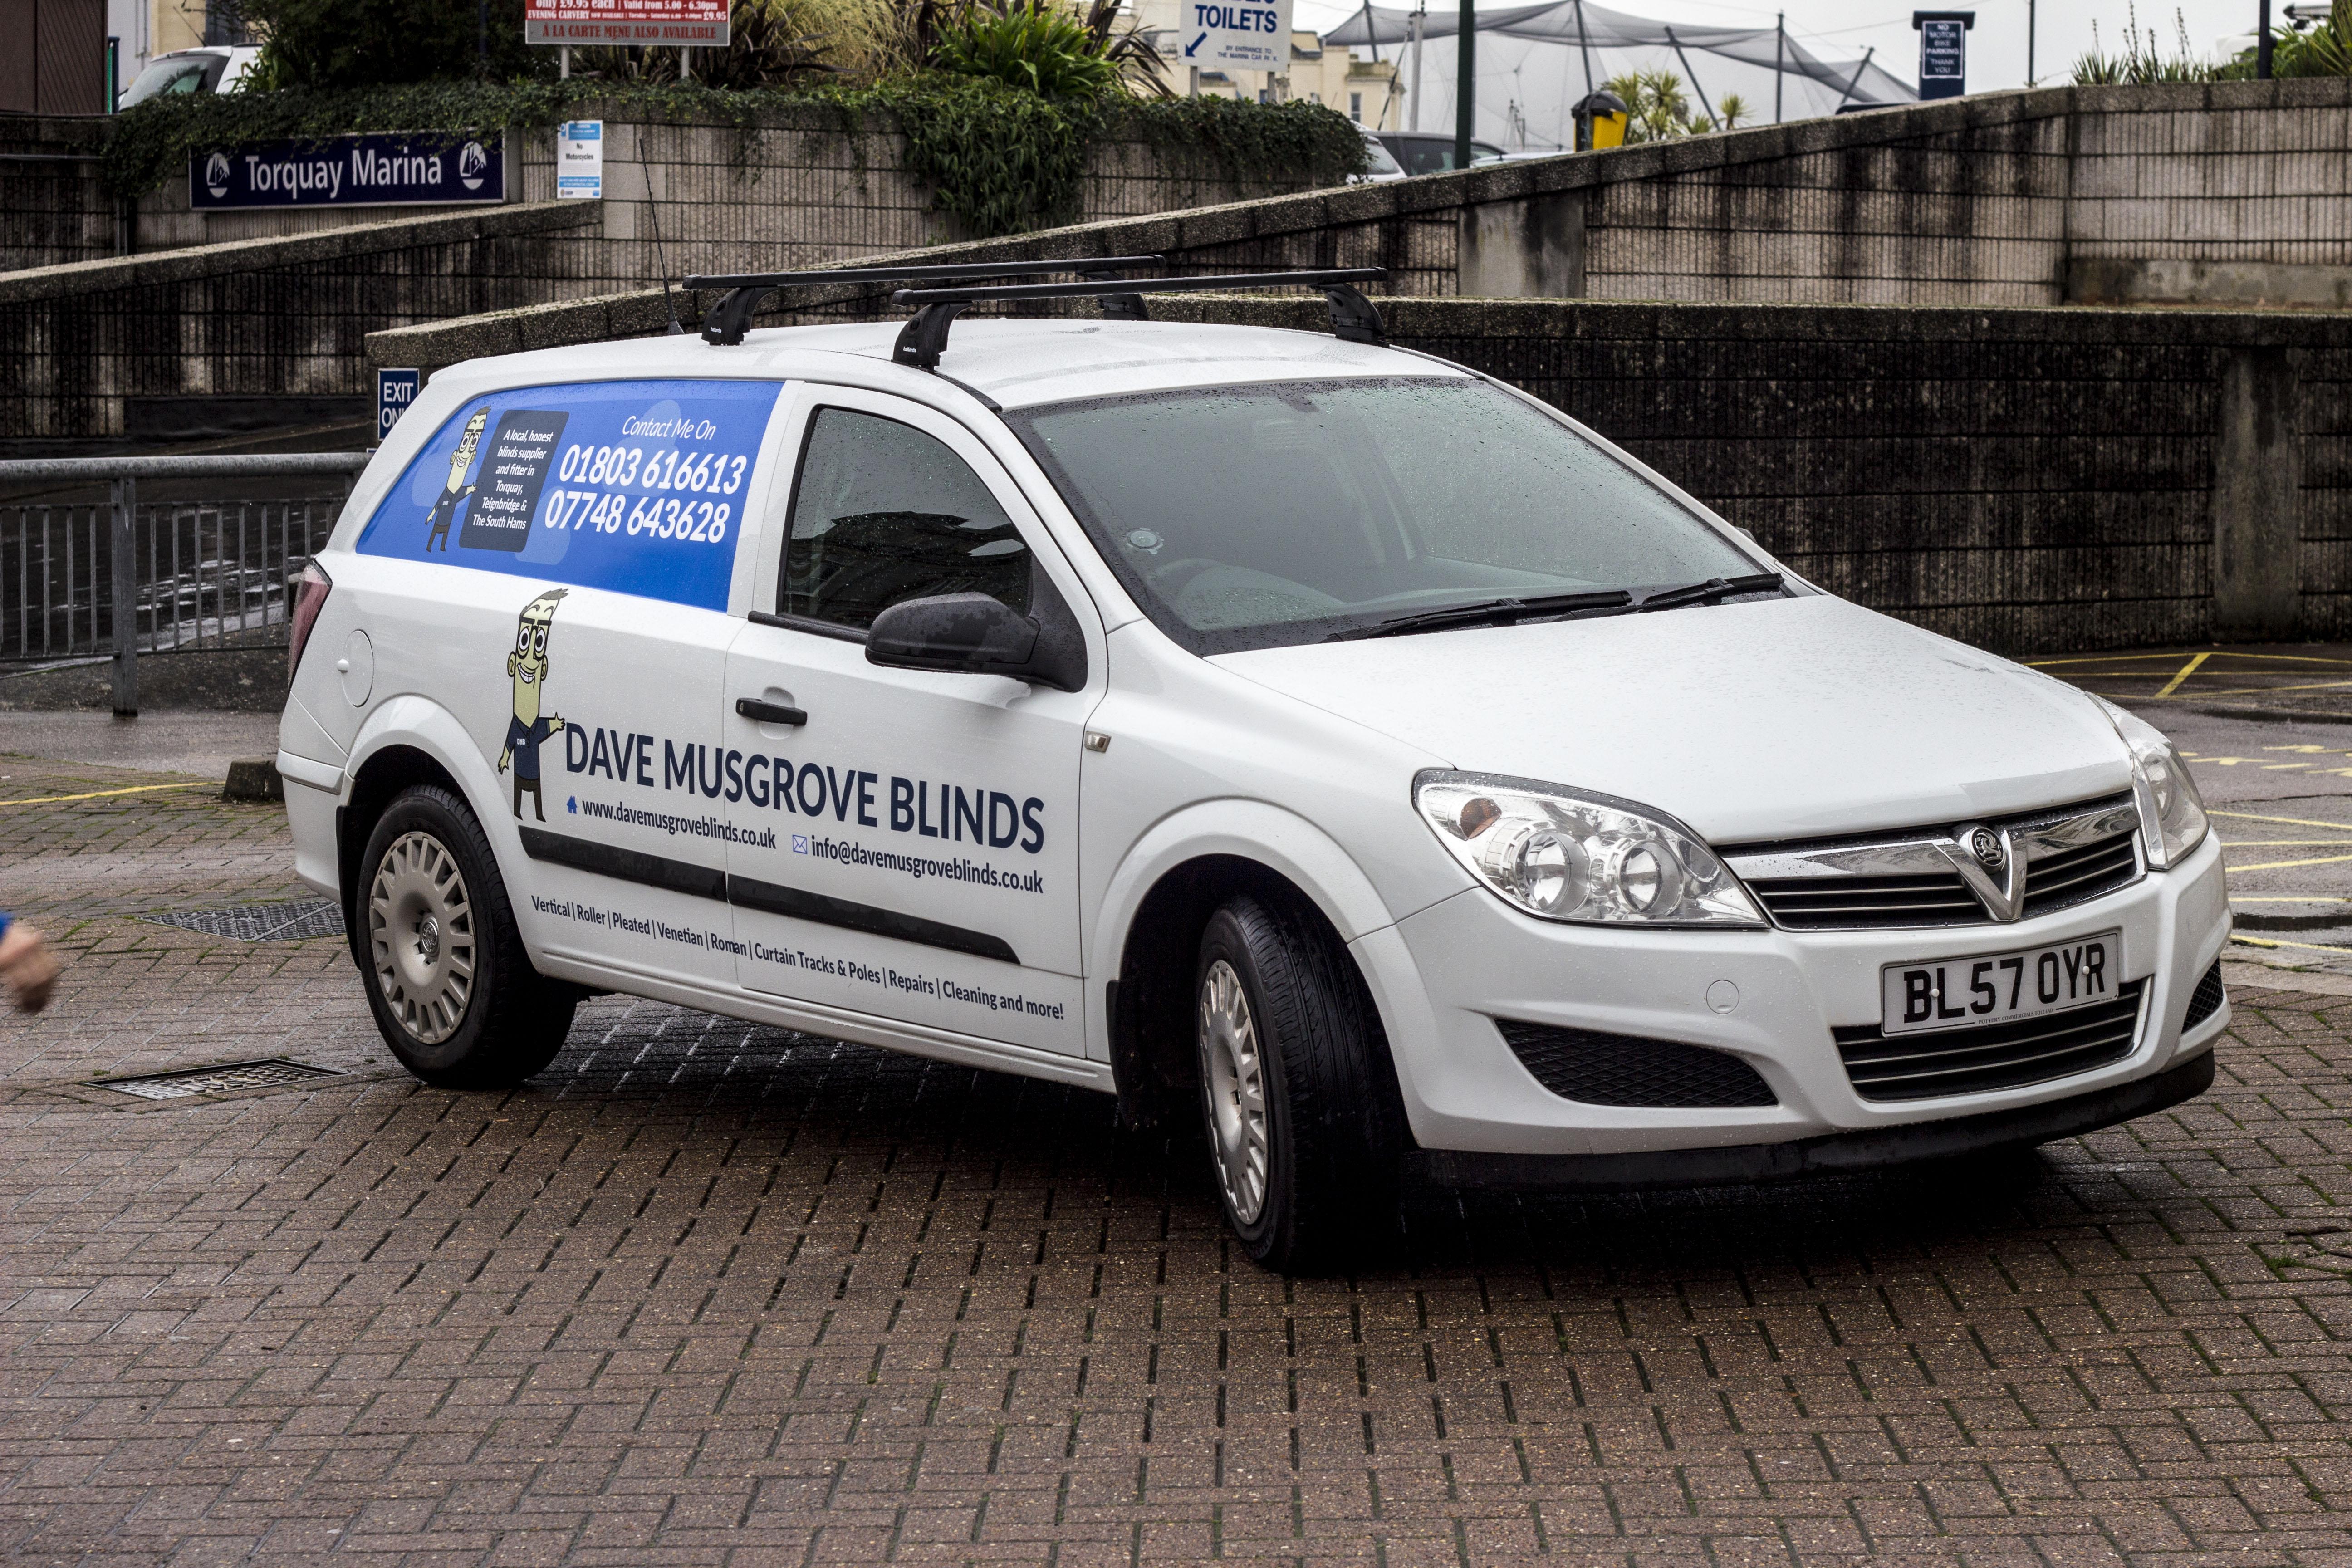 My New Van Dave Musgrove Blinds